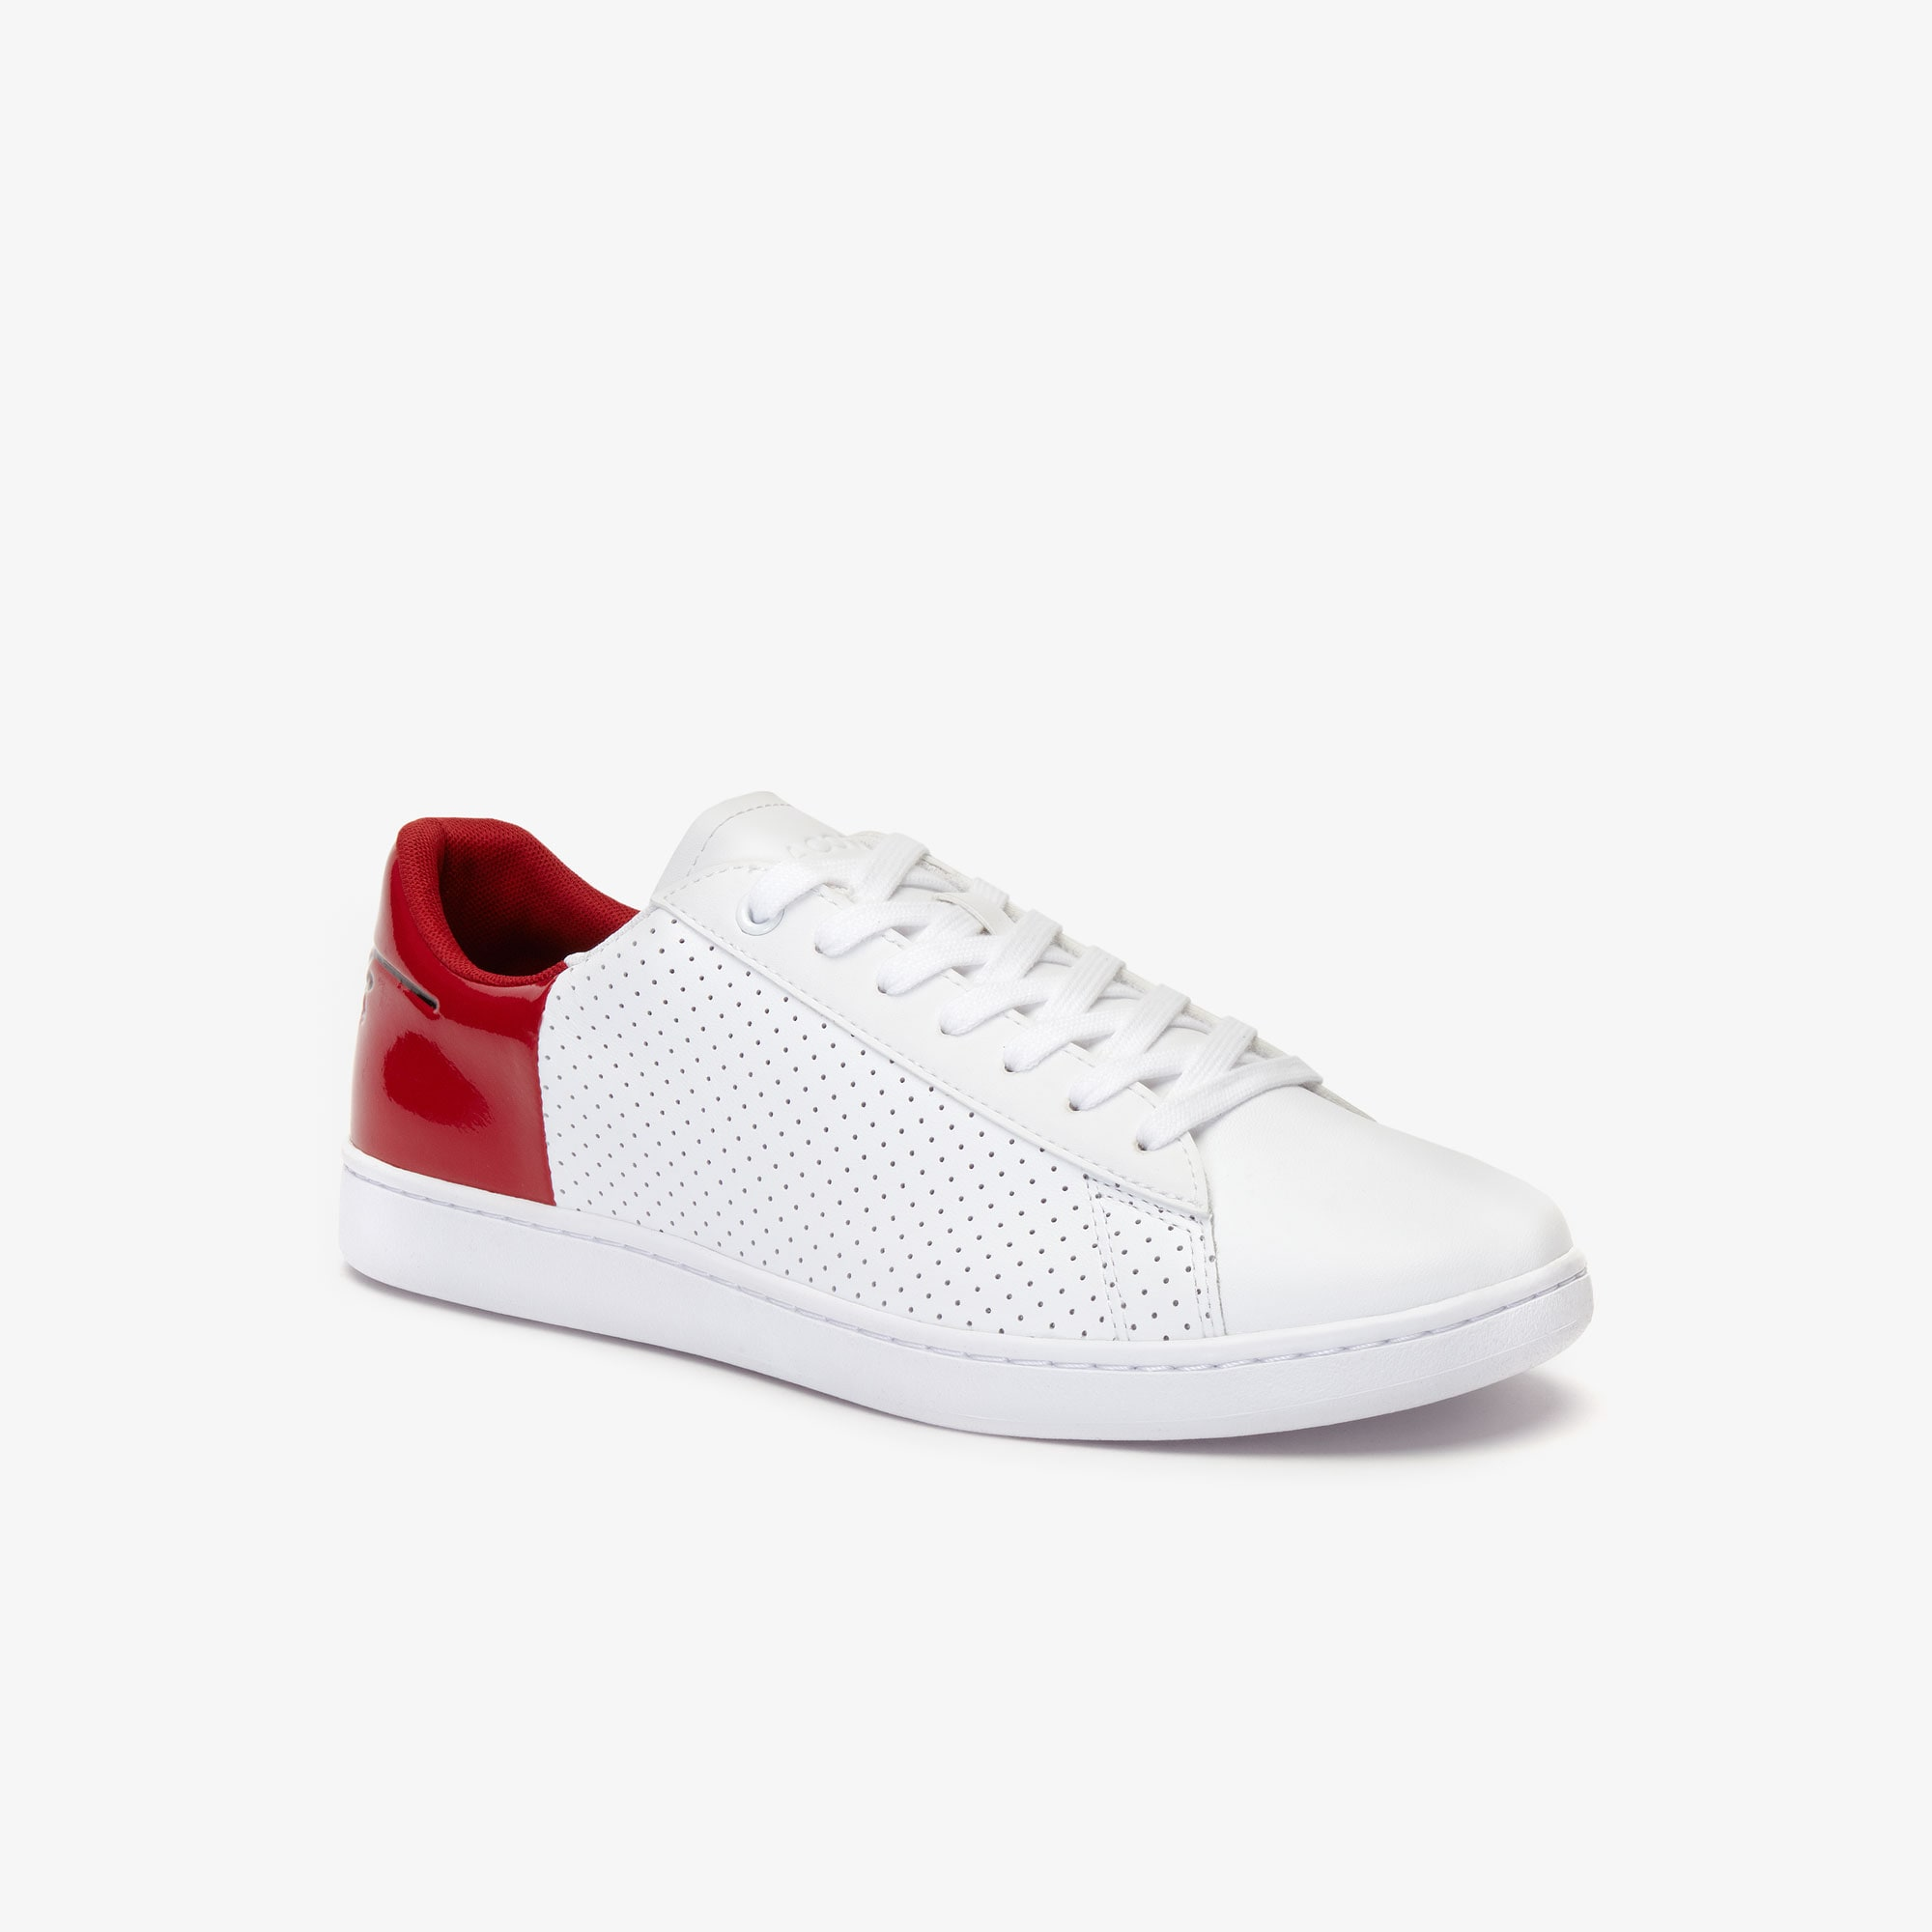 Lacoste Flats Men's Carnaby Sneakers